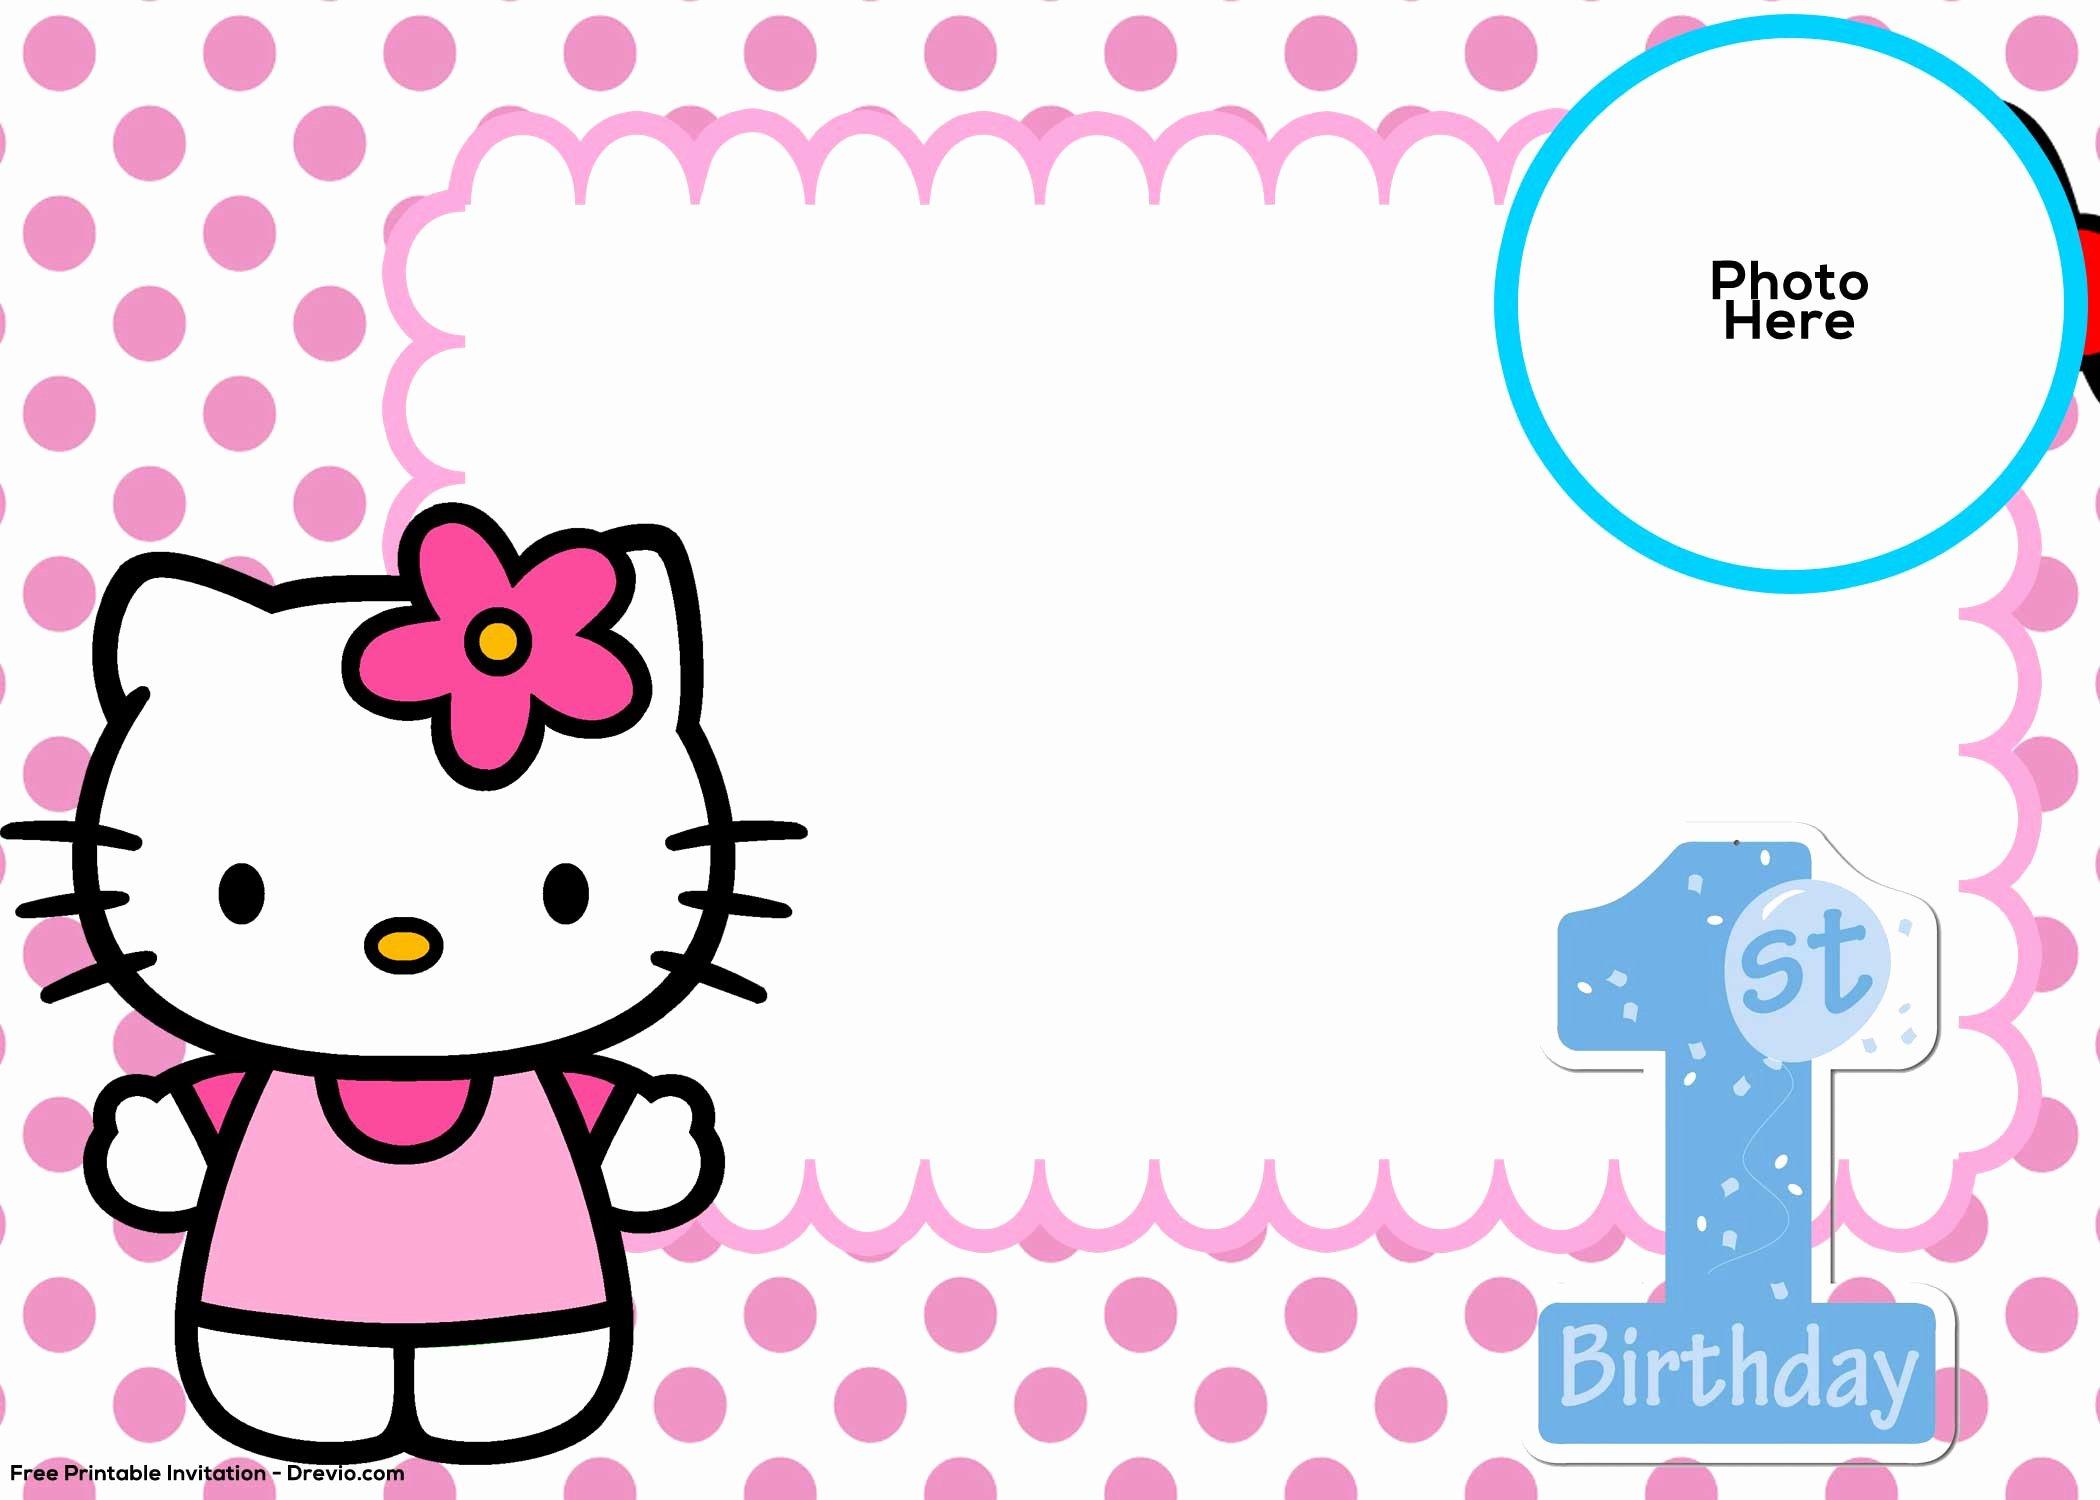 Hello Kitty Invitation Template Lovely Free Hello Kitty 1st Birthday Invitation Template